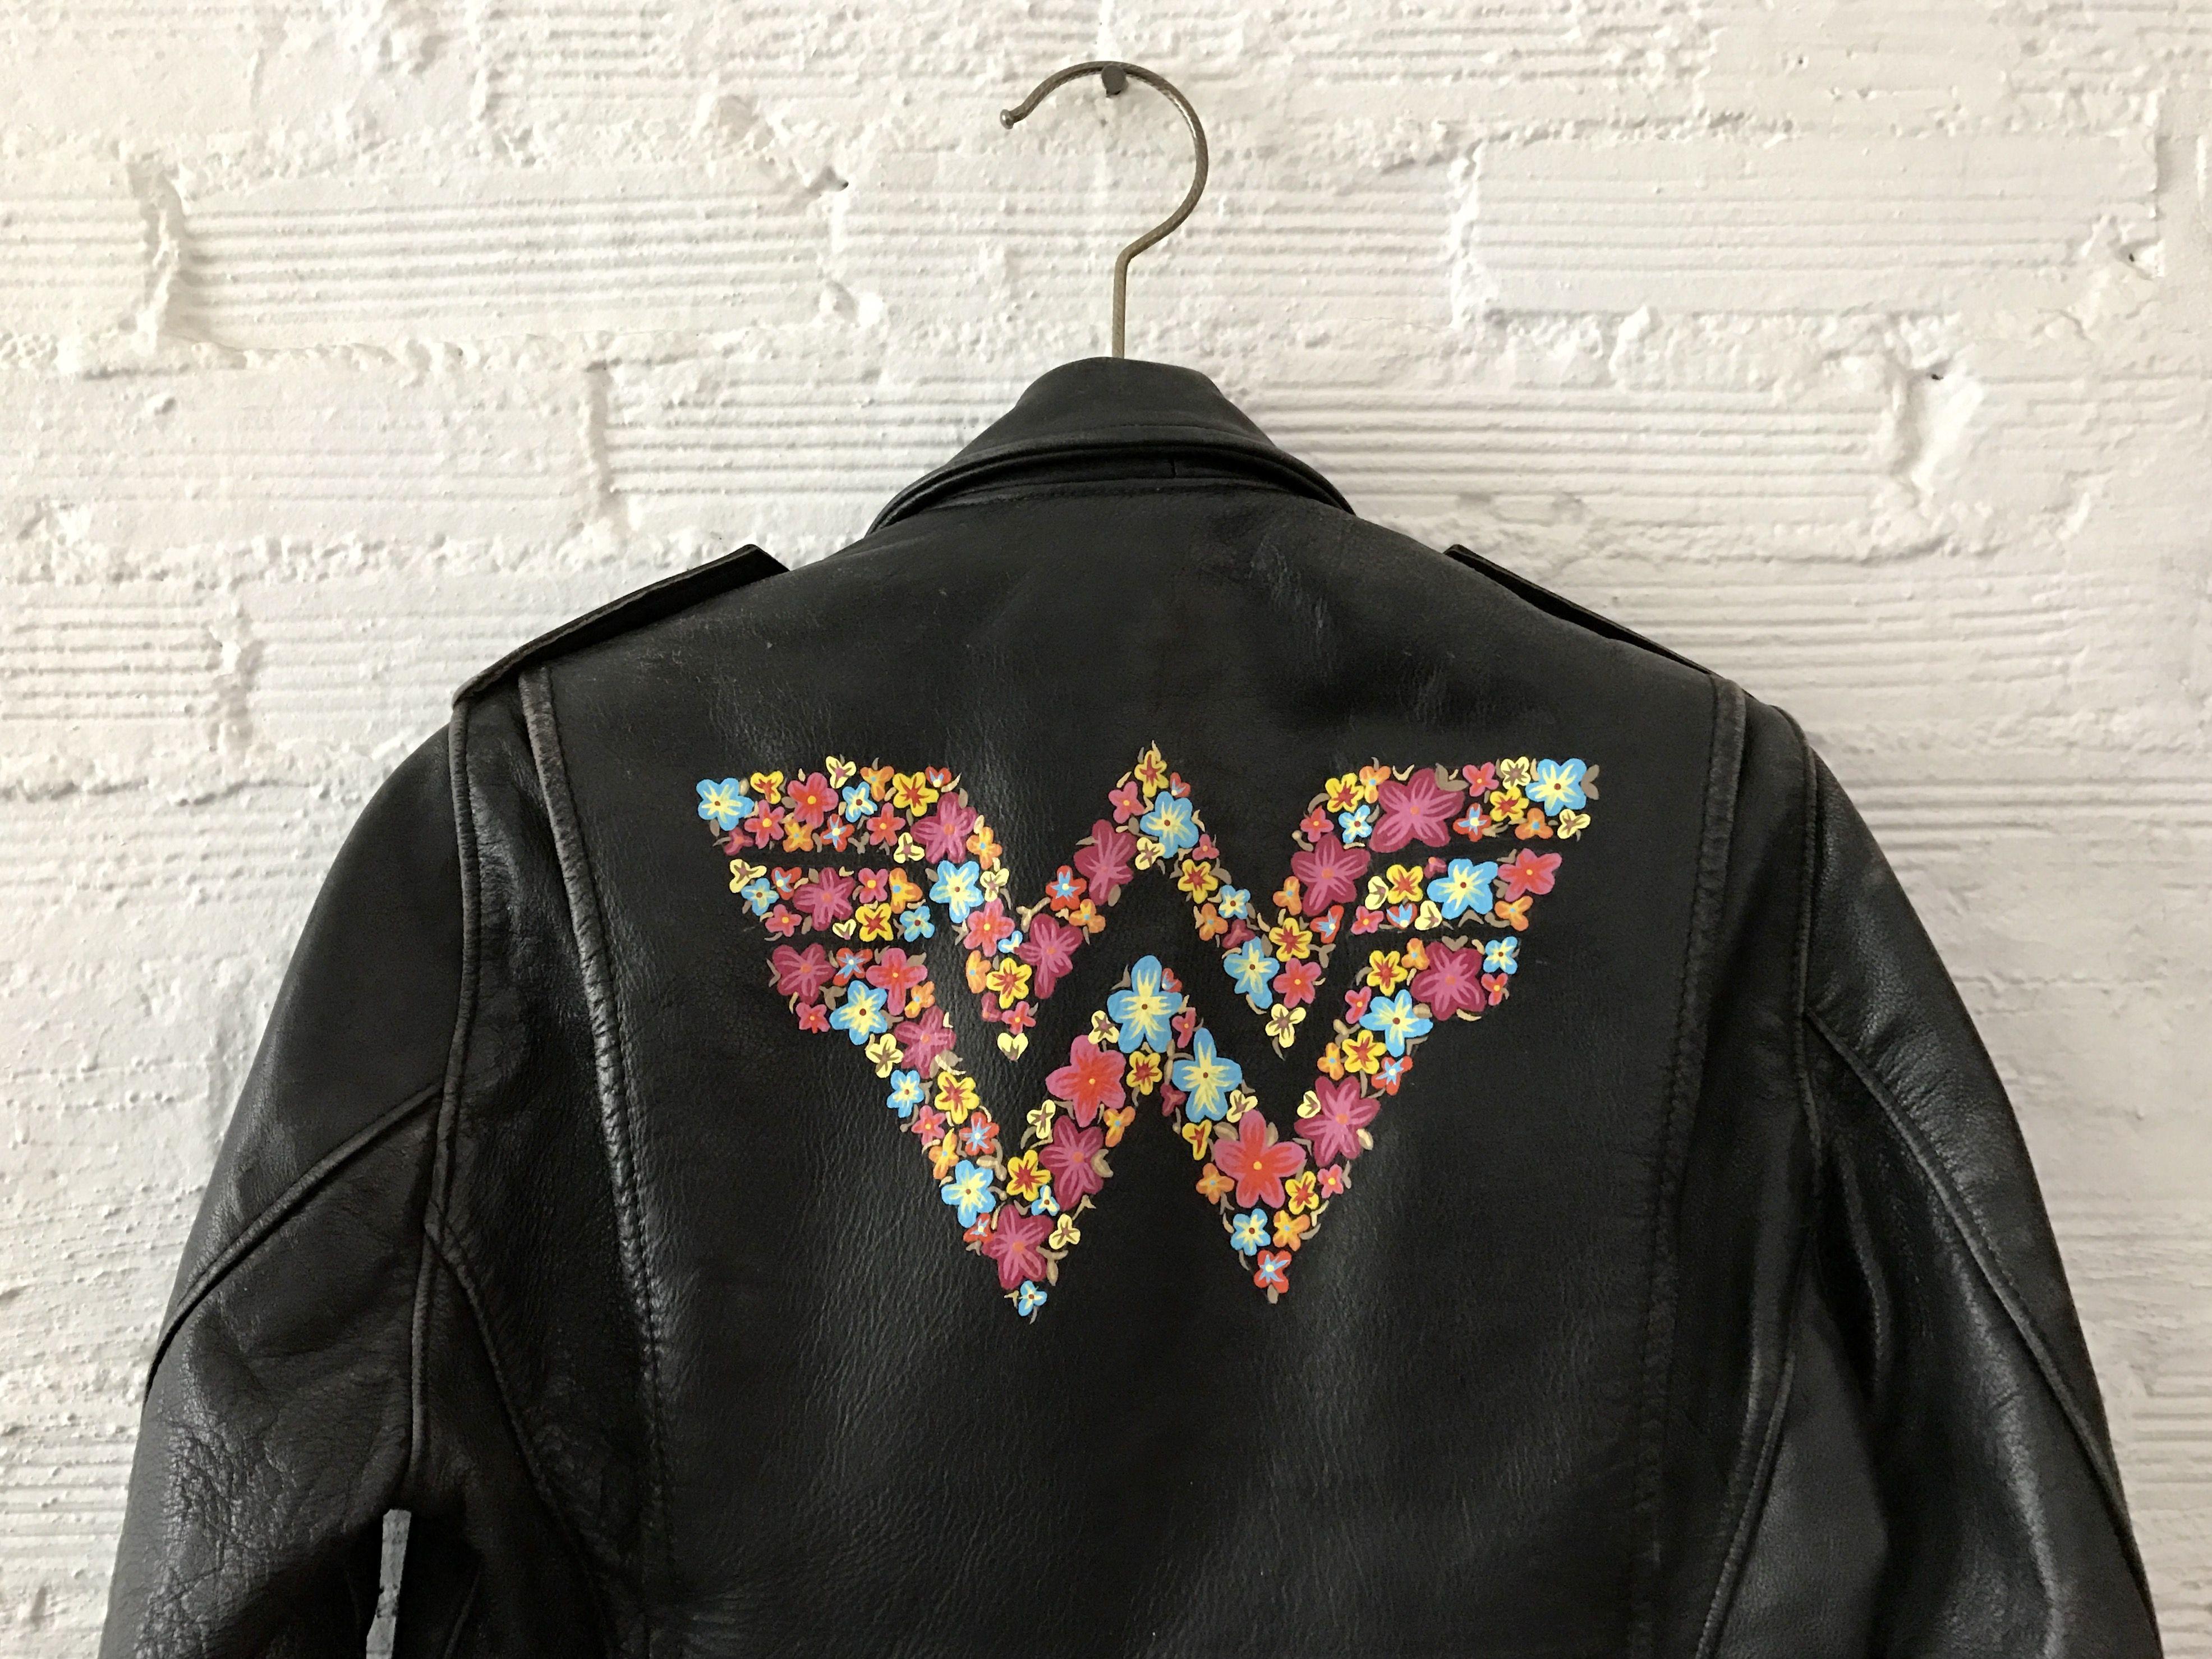 WONDER WOMAN hand painted logo on vintage leather jacket